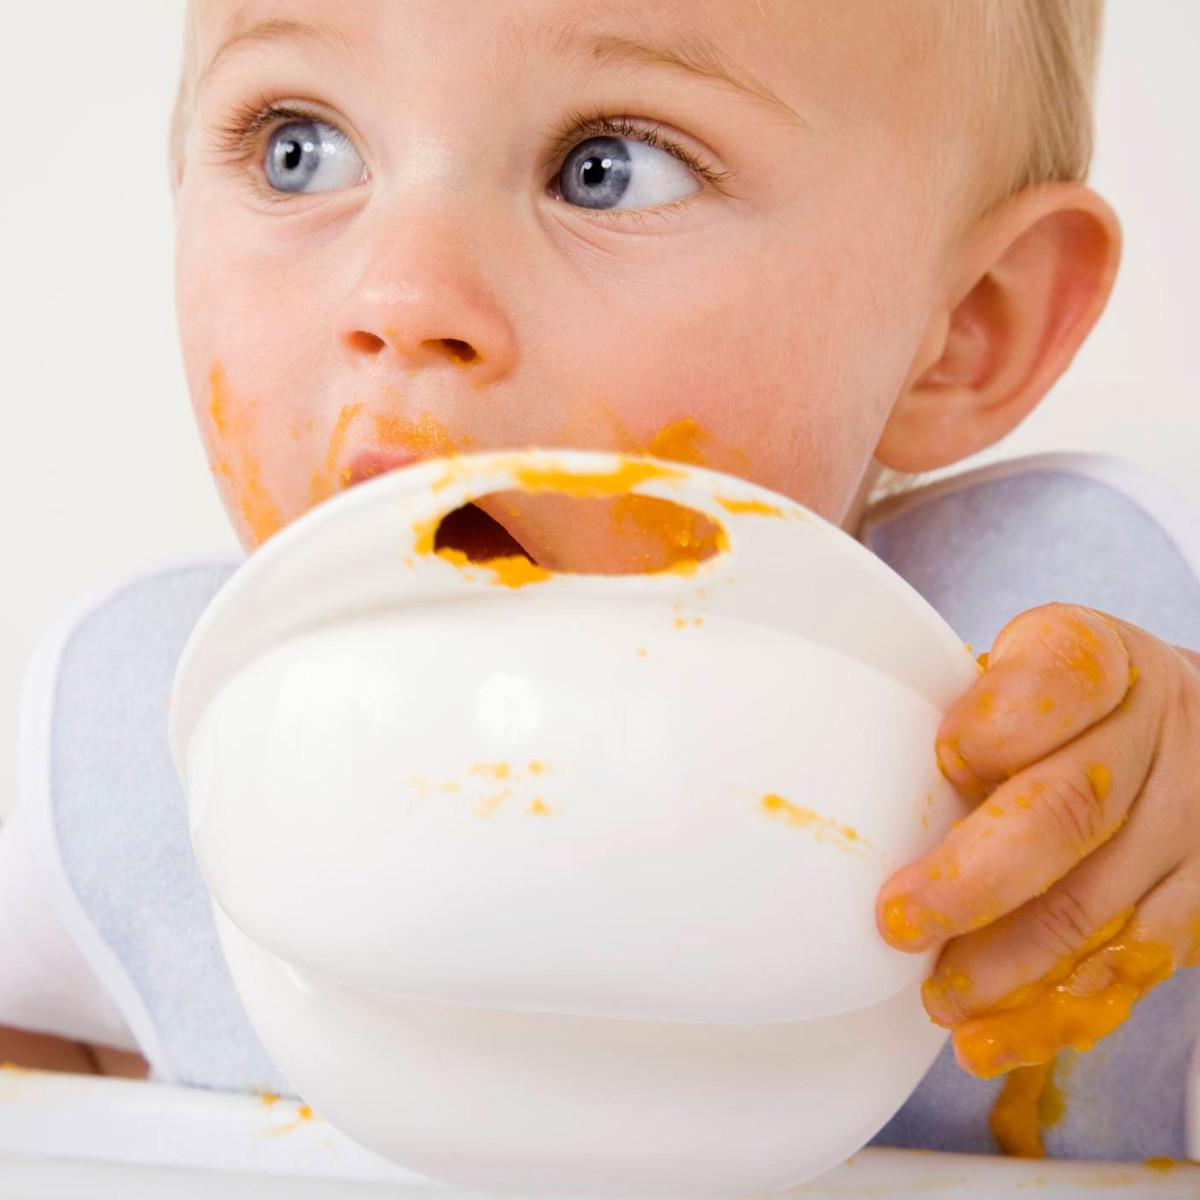 Alimentos proibidos para bebês